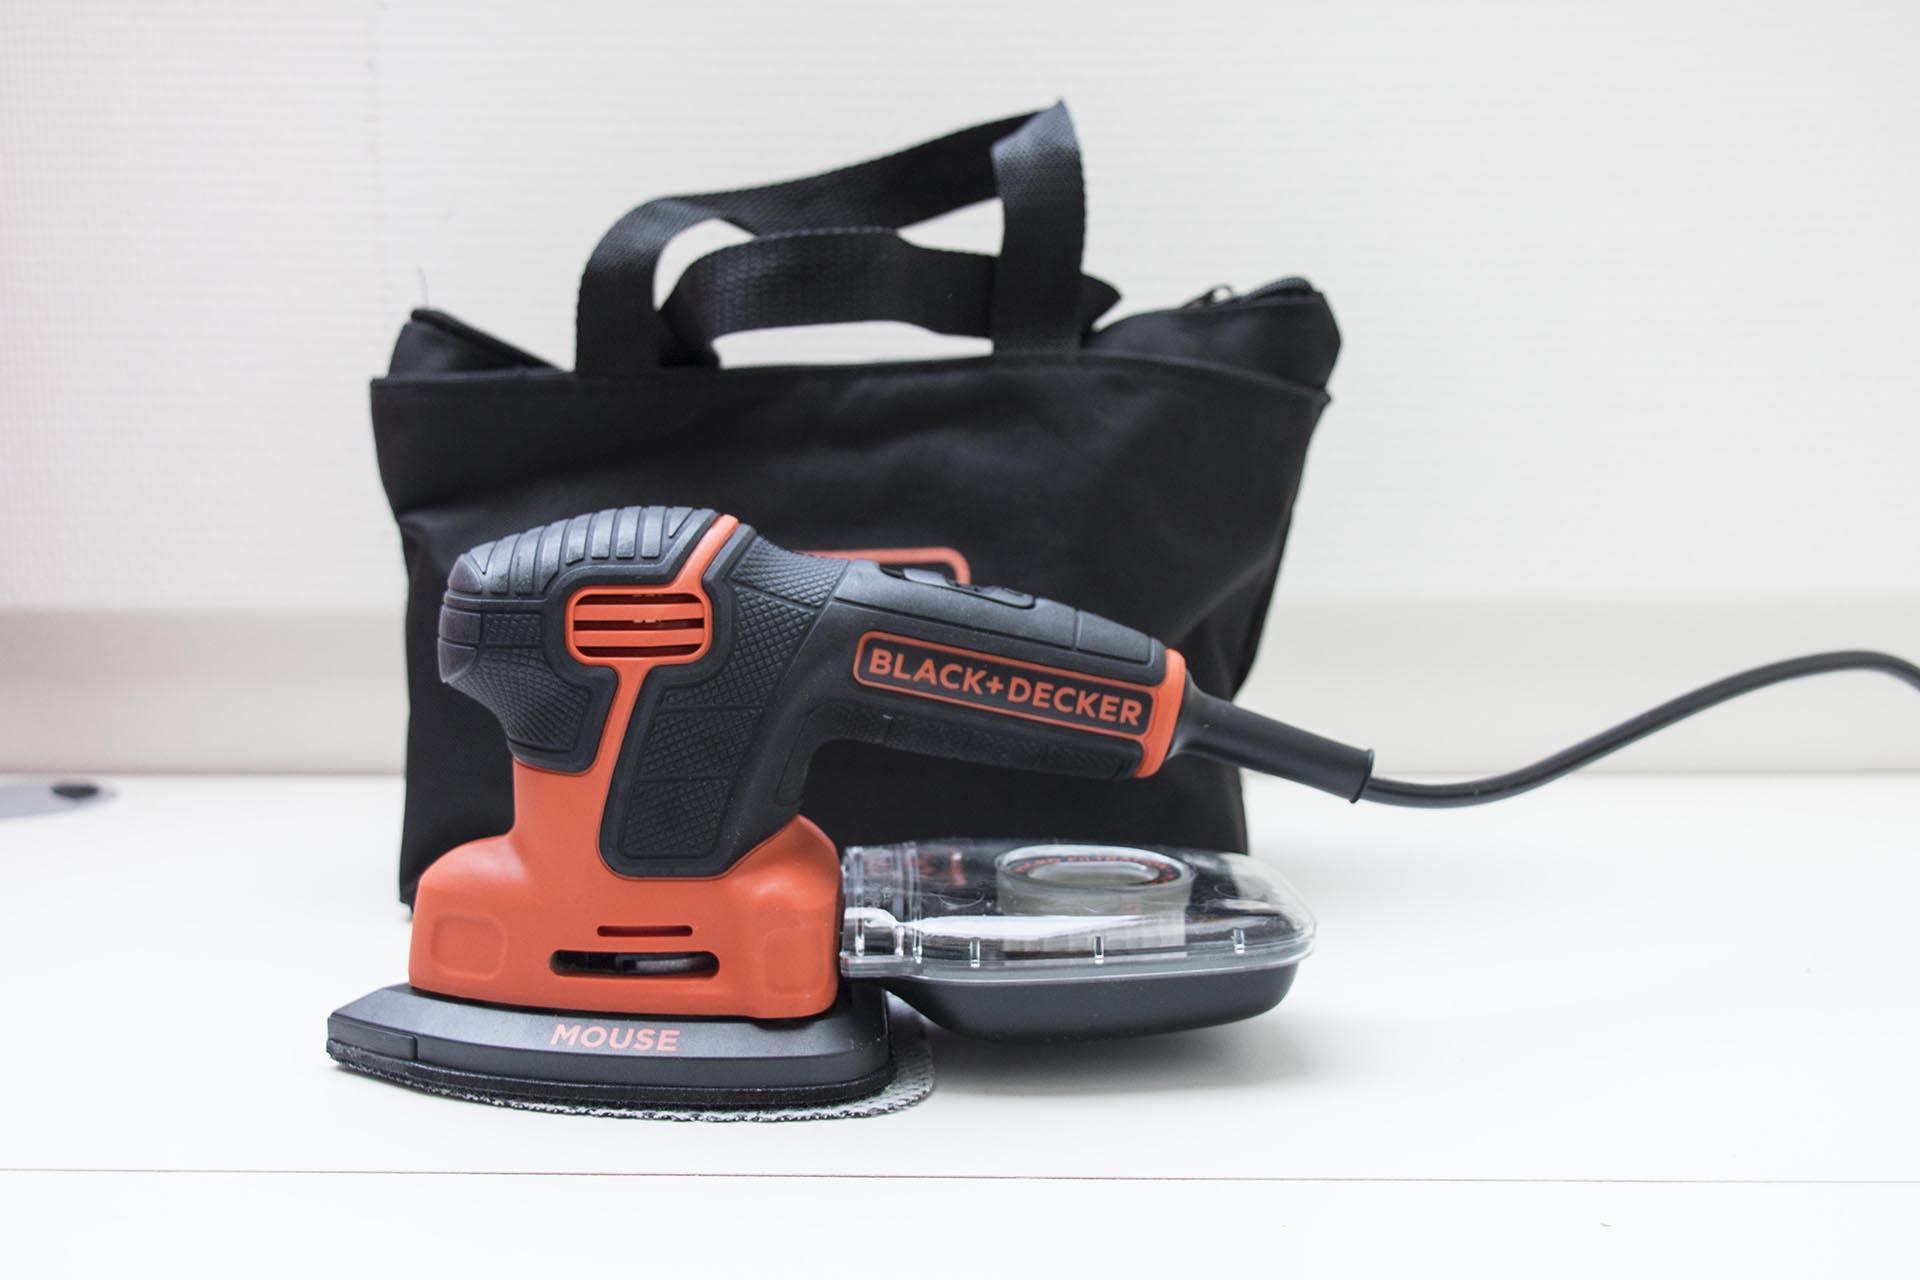 Genoeg Review: Black+Decker Next Generation Mouse 120W (schuurmachine CJ71